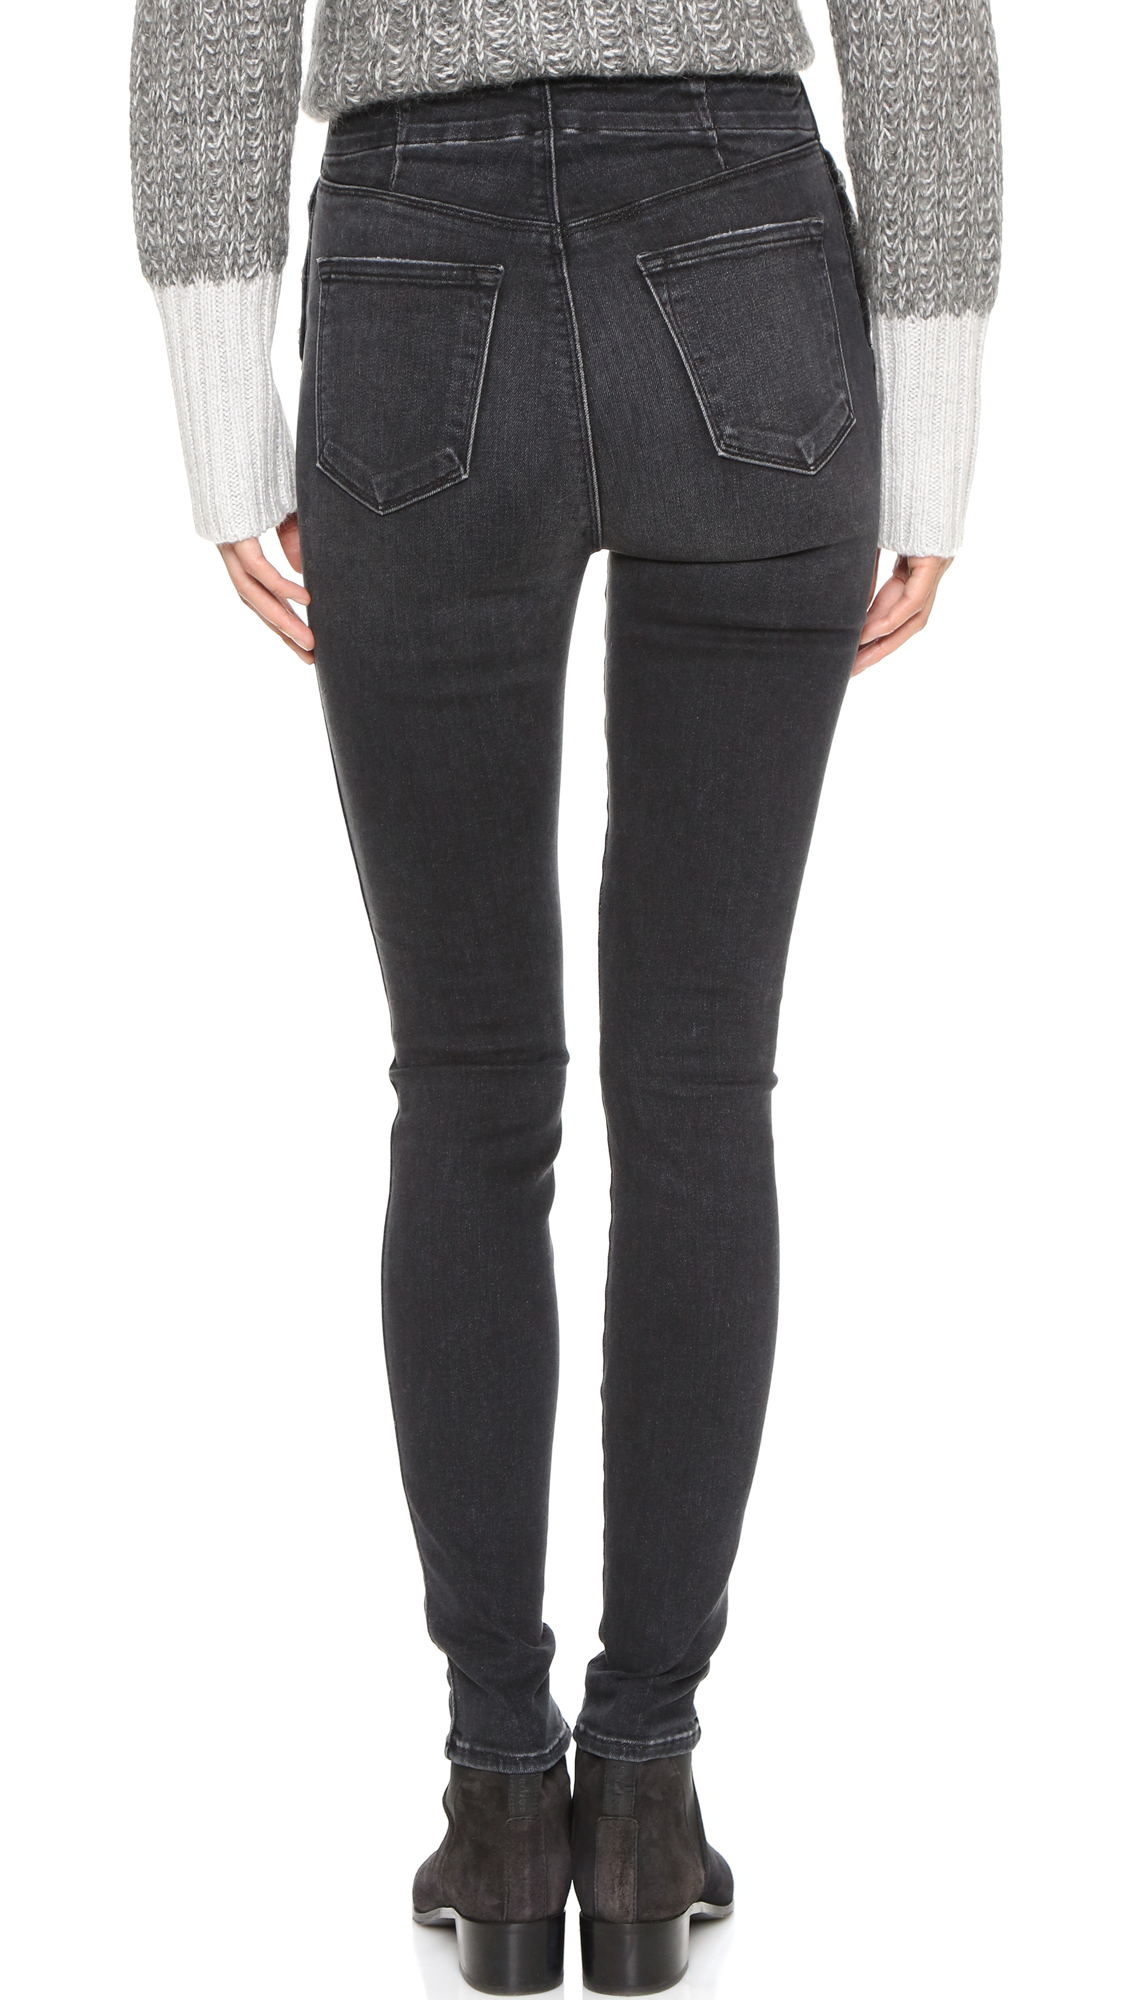 Skinny Brand Jeans